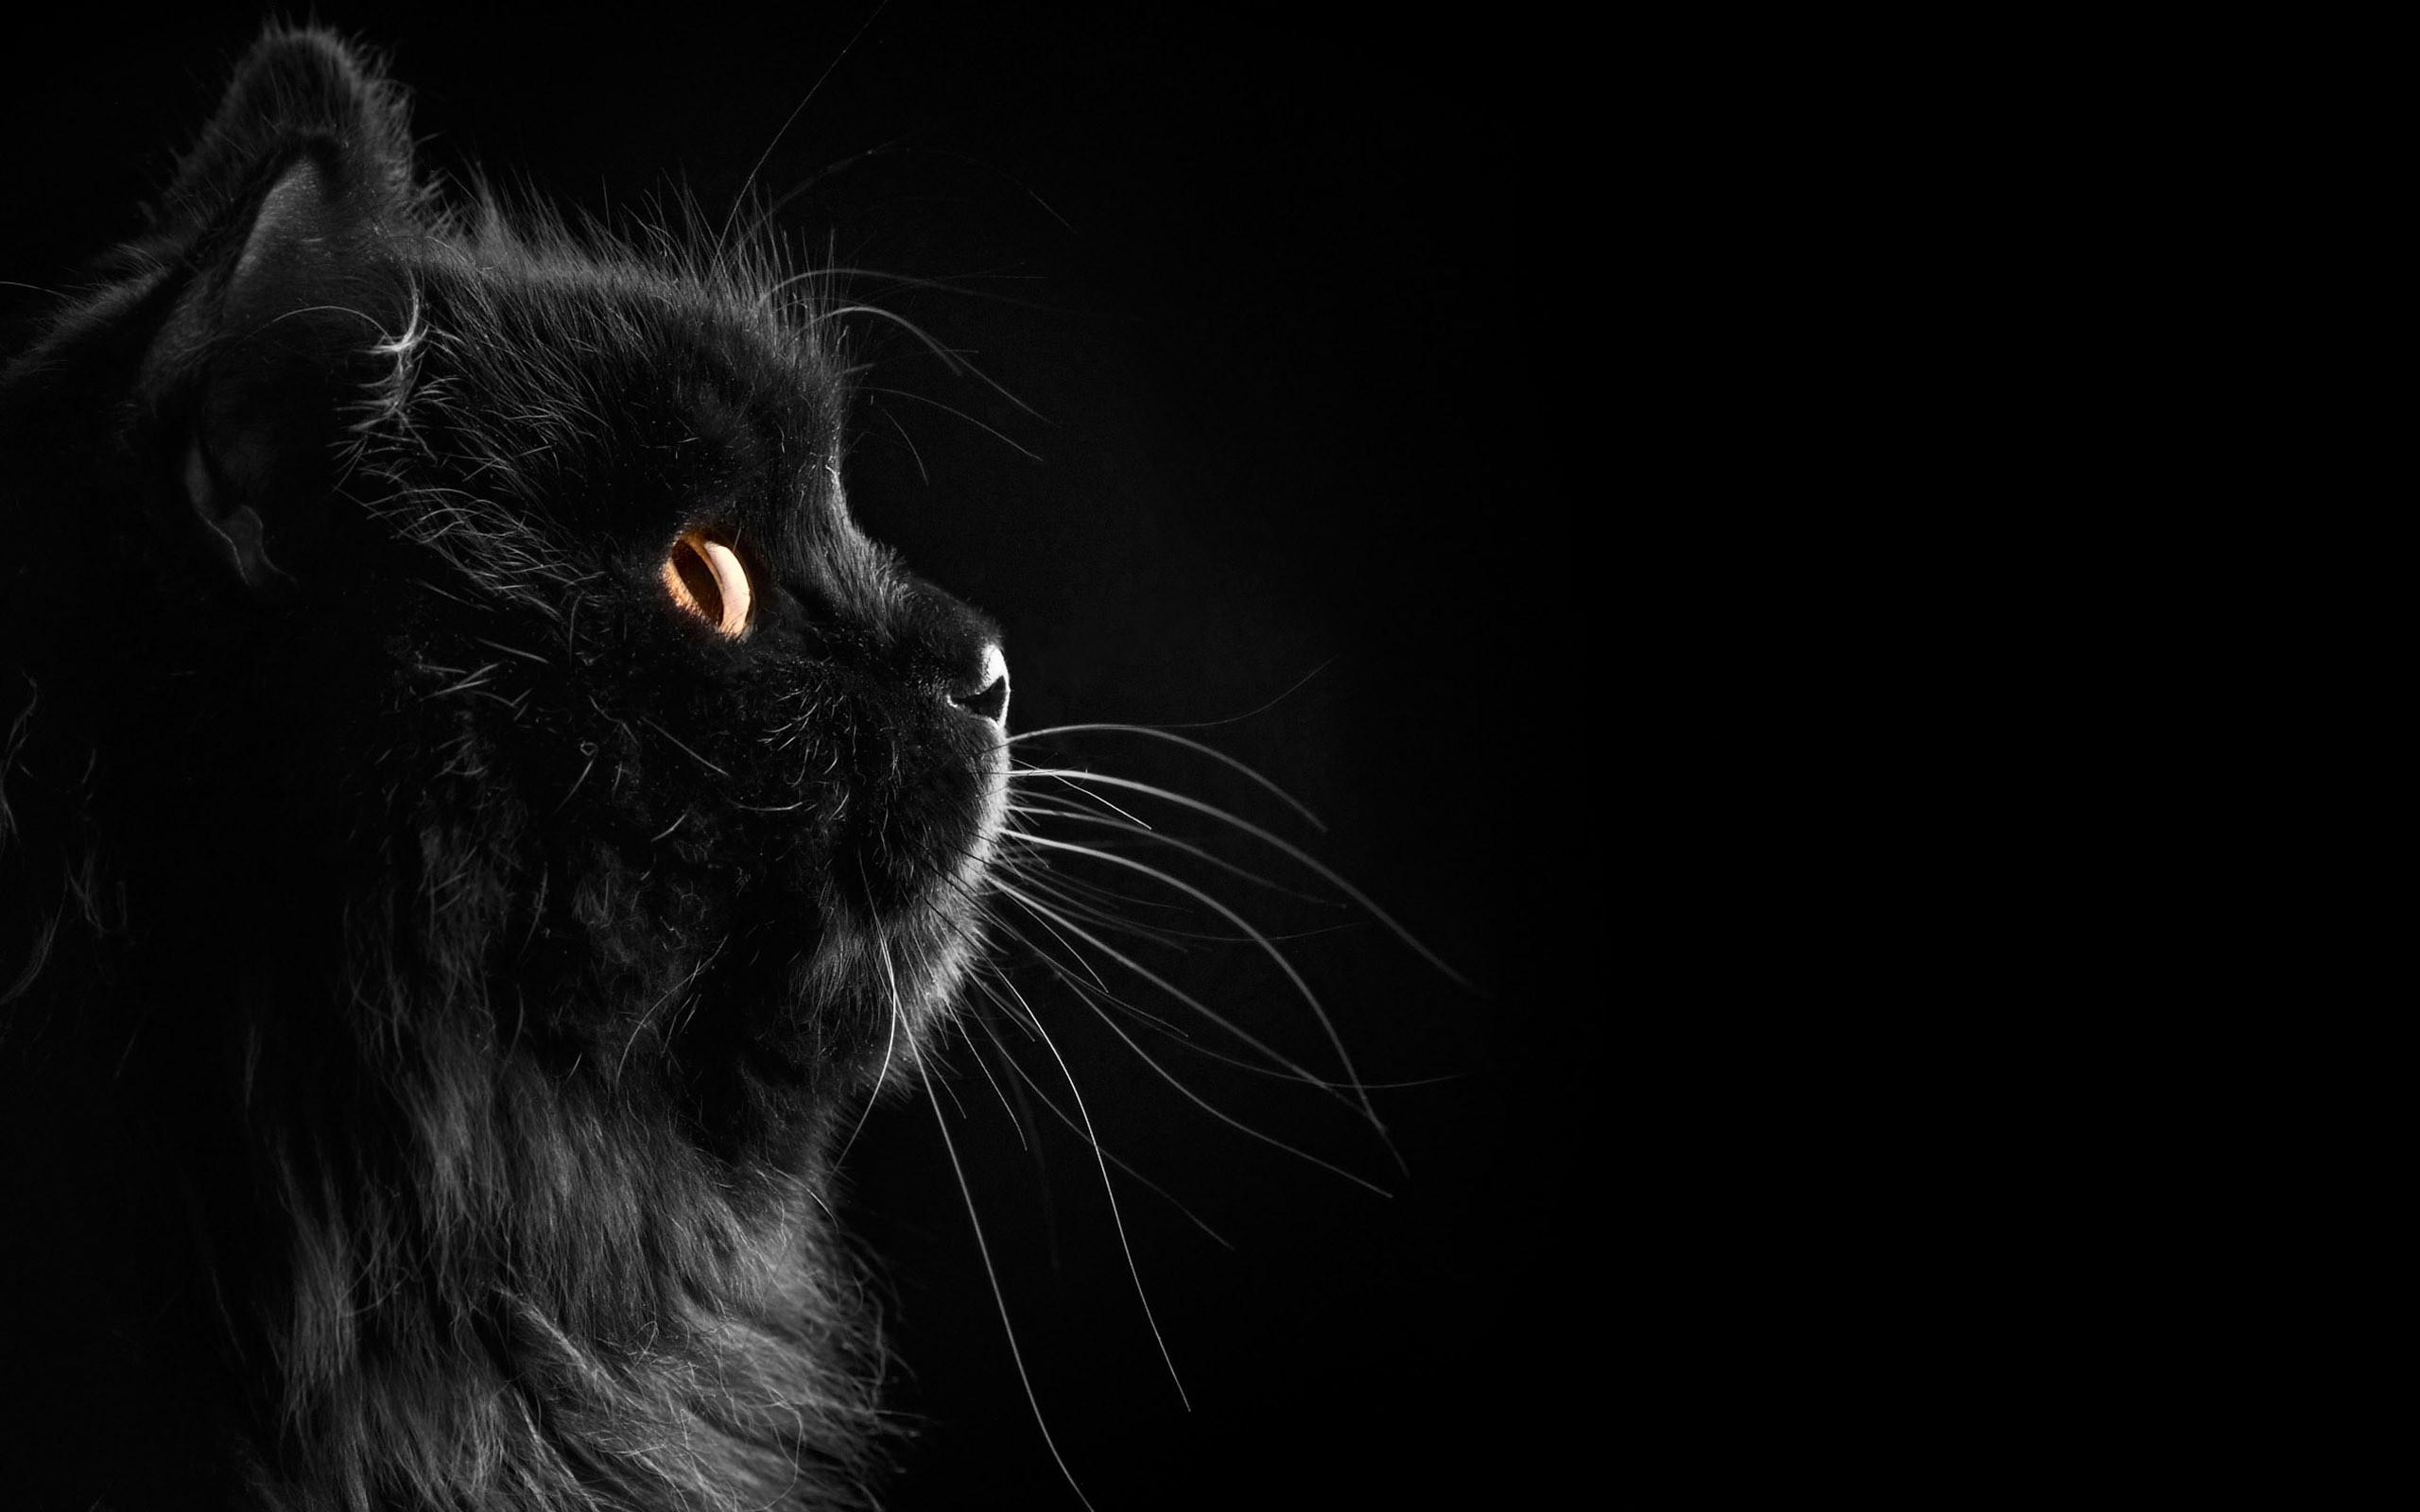 Black Cat Wallpaper 24160 px ~ HDWallSource.com · black cats and  kittens …